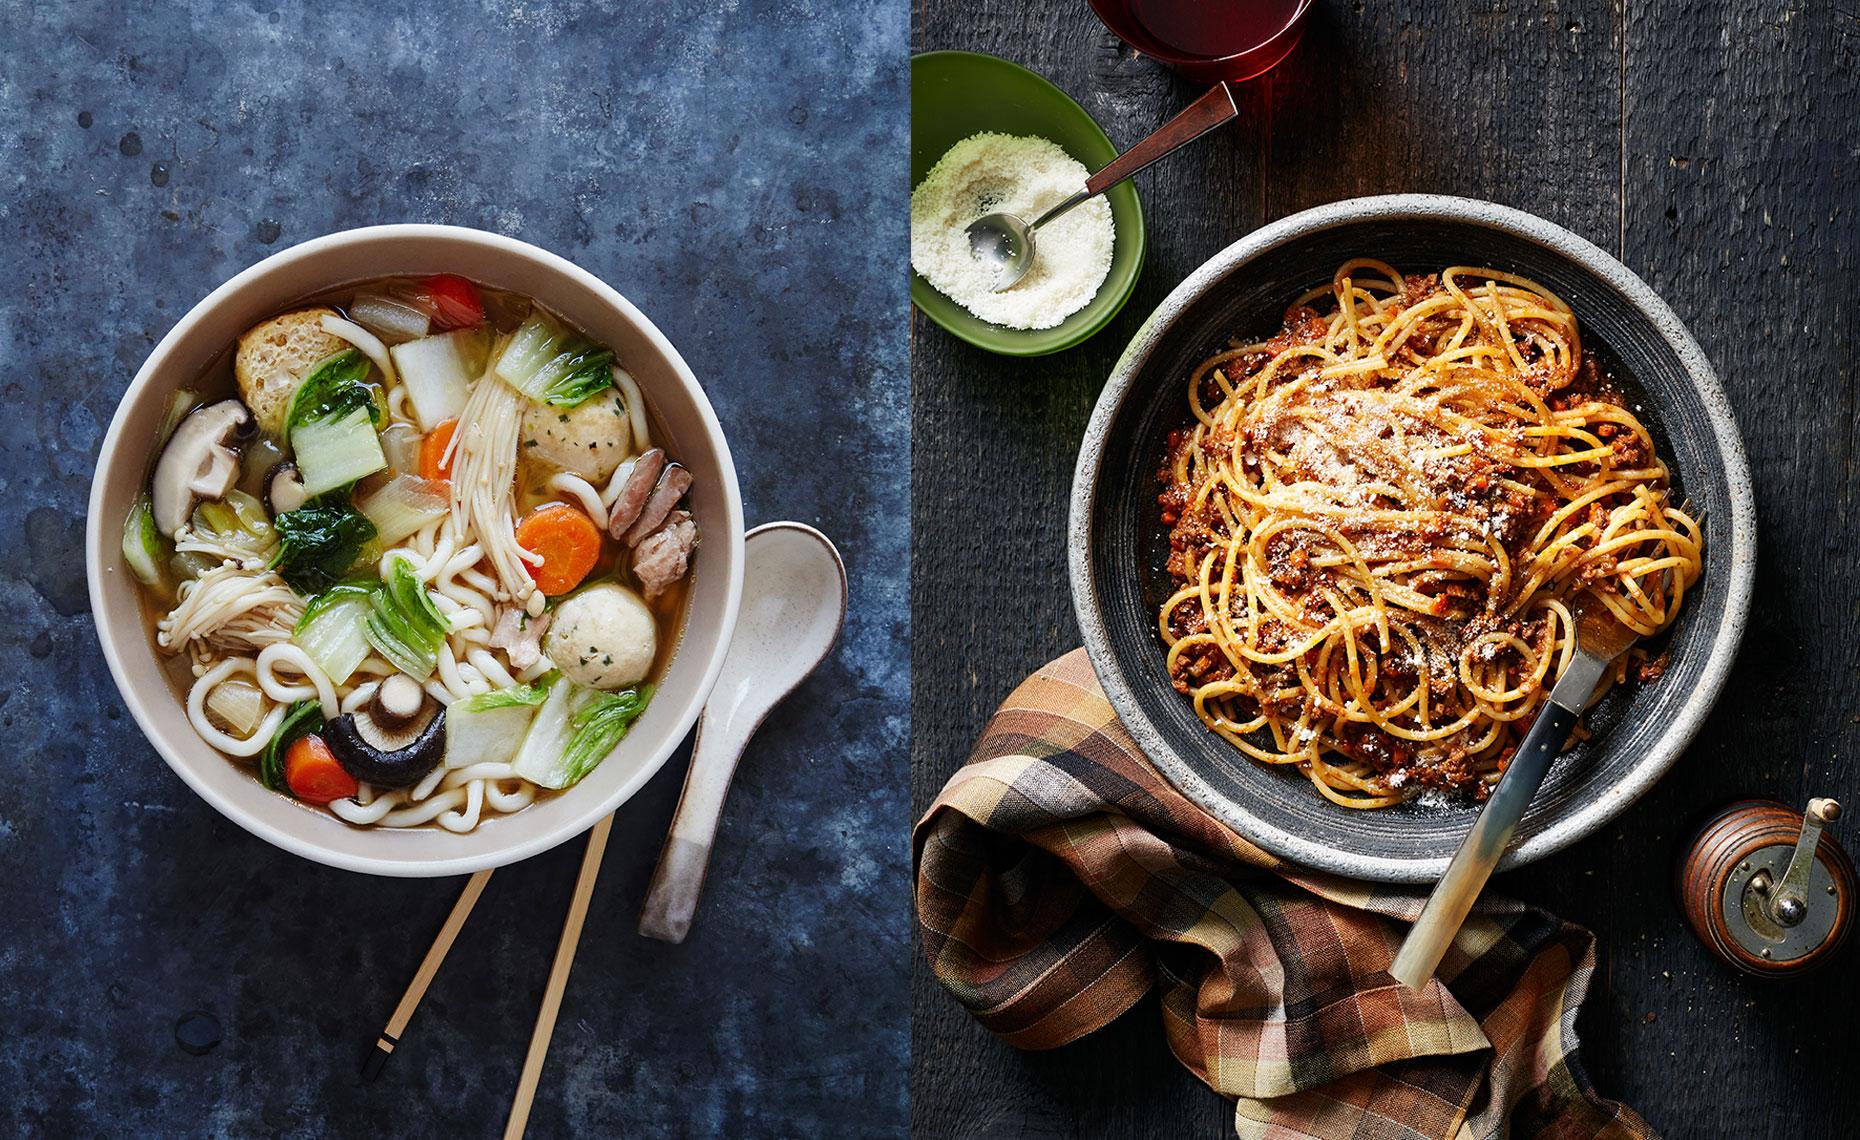 sumo-stew-and-spaghetti.jpg